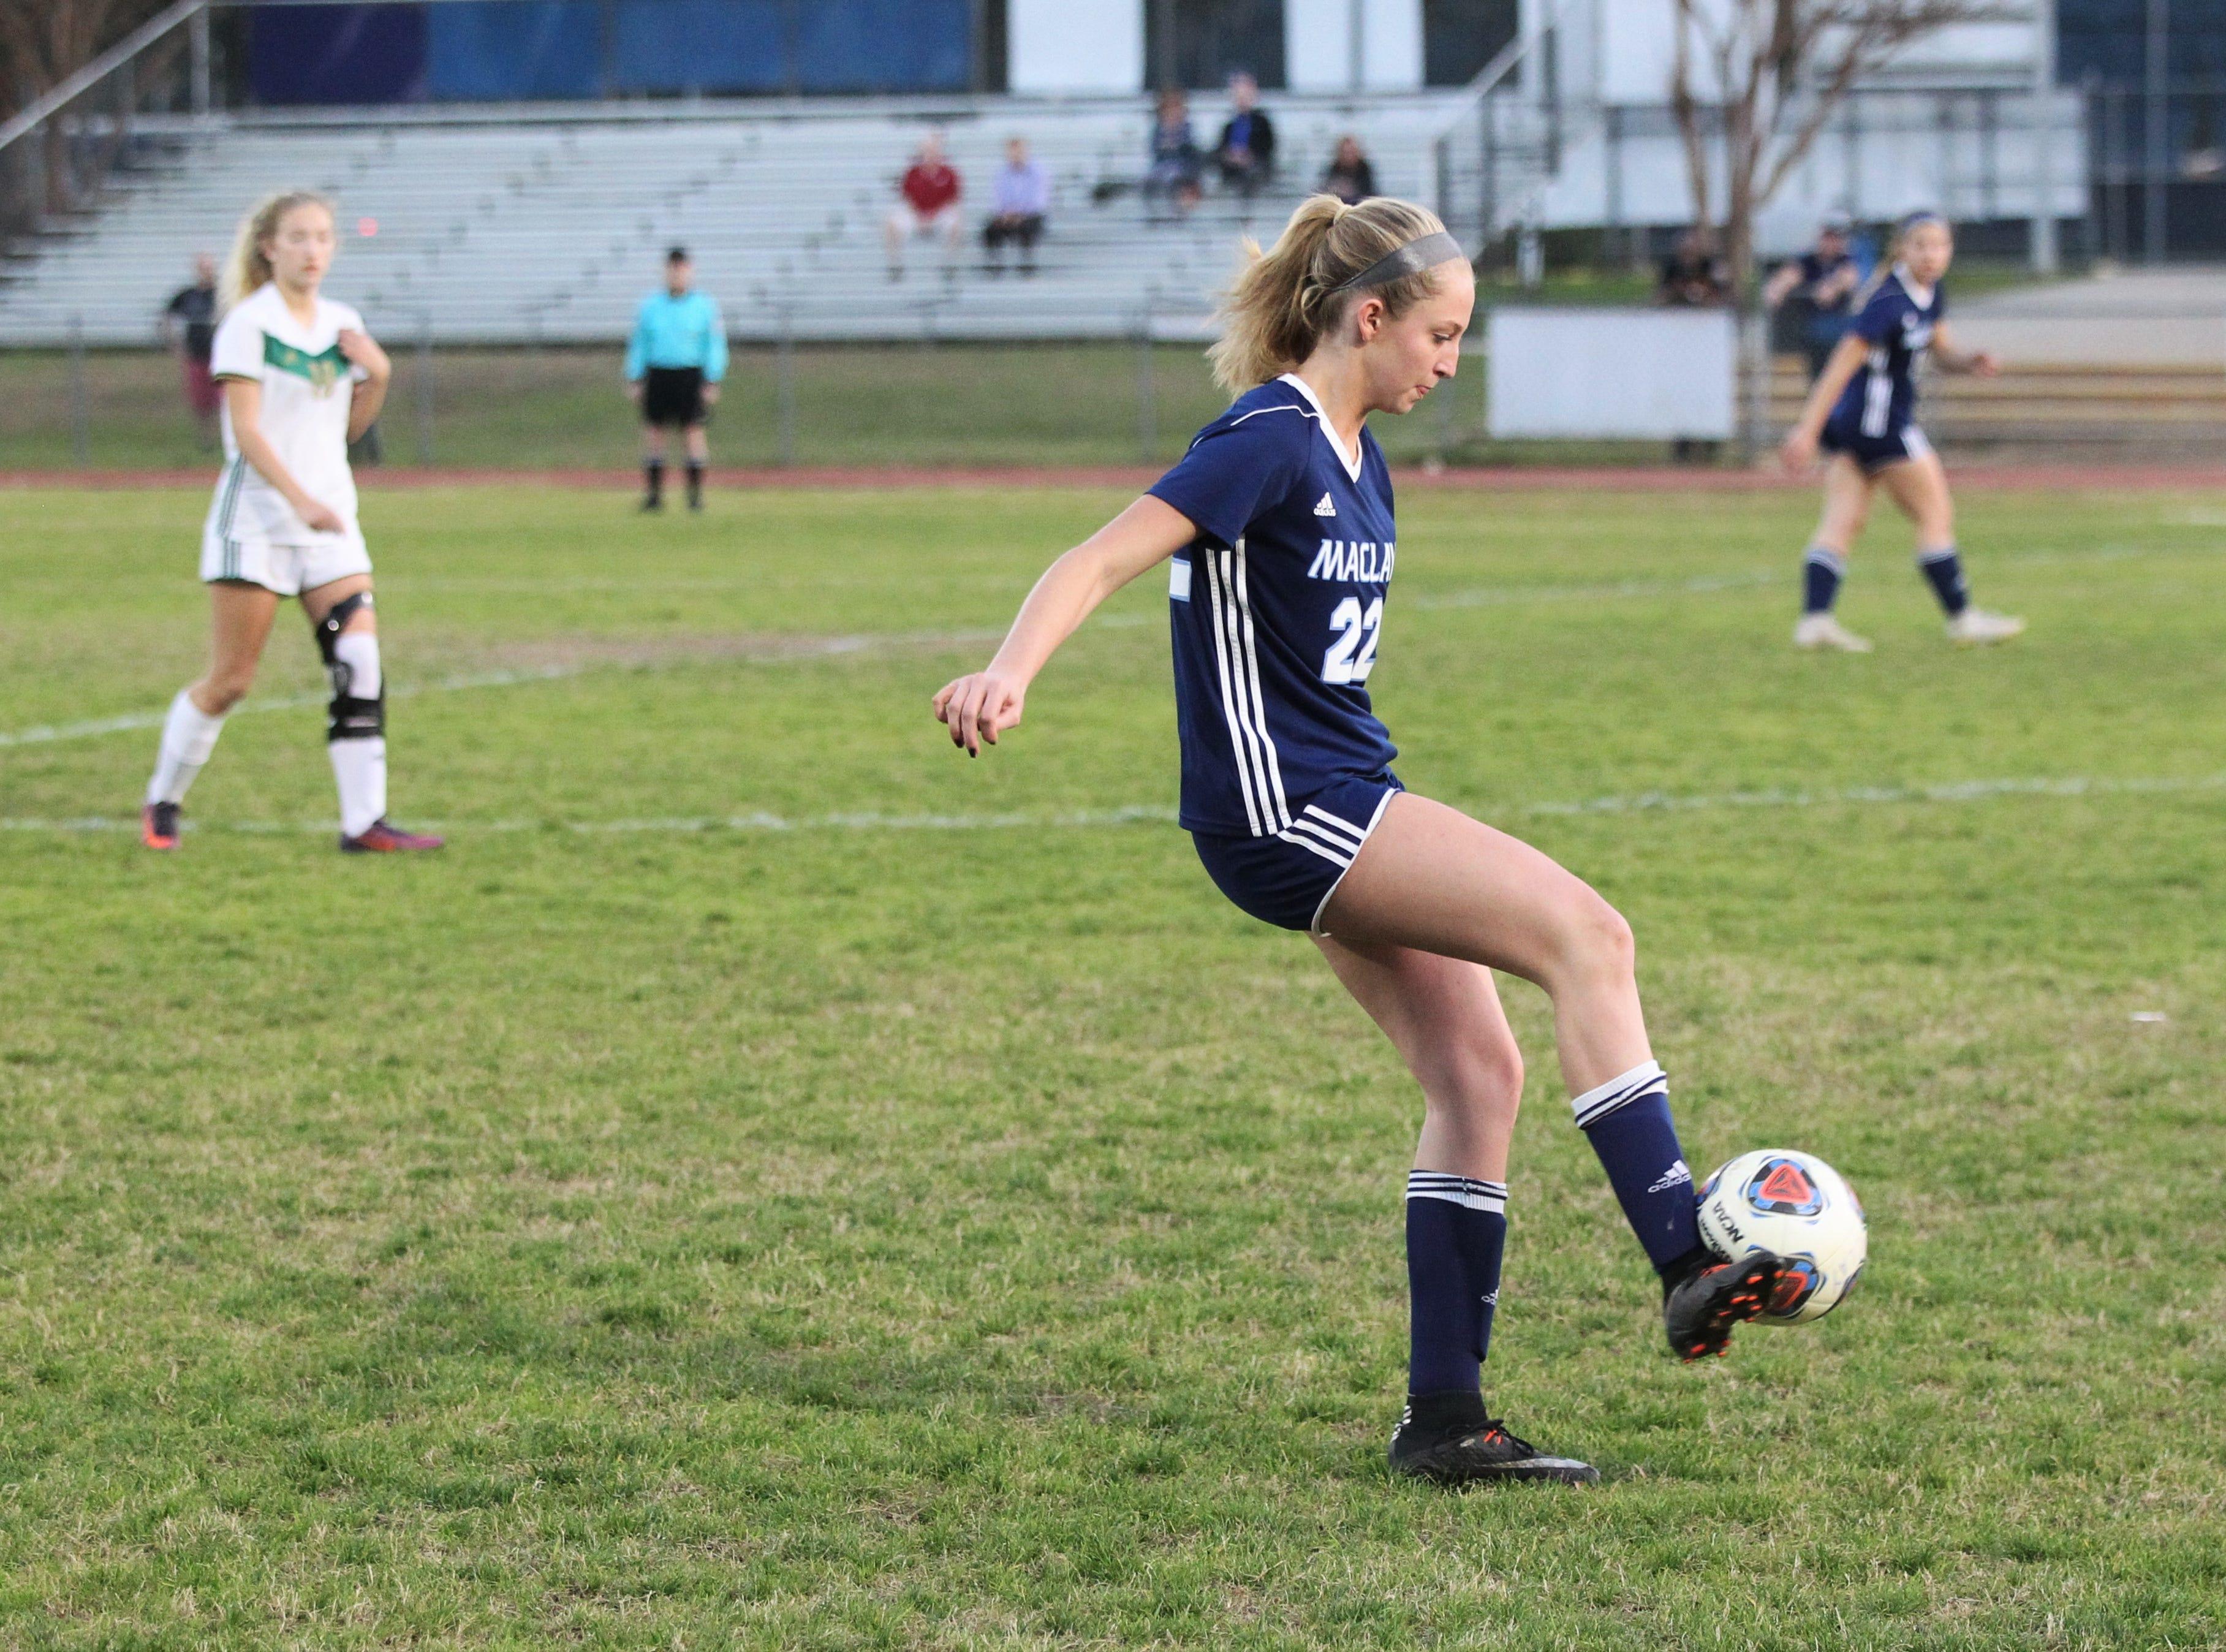 Maclay's Edy Rash passes a ball ahead as Maclay's girls soccer team beat St. Joseph Academy 4-0 in a Region 1-1A quarterfinal on Jan. 5, 2019.